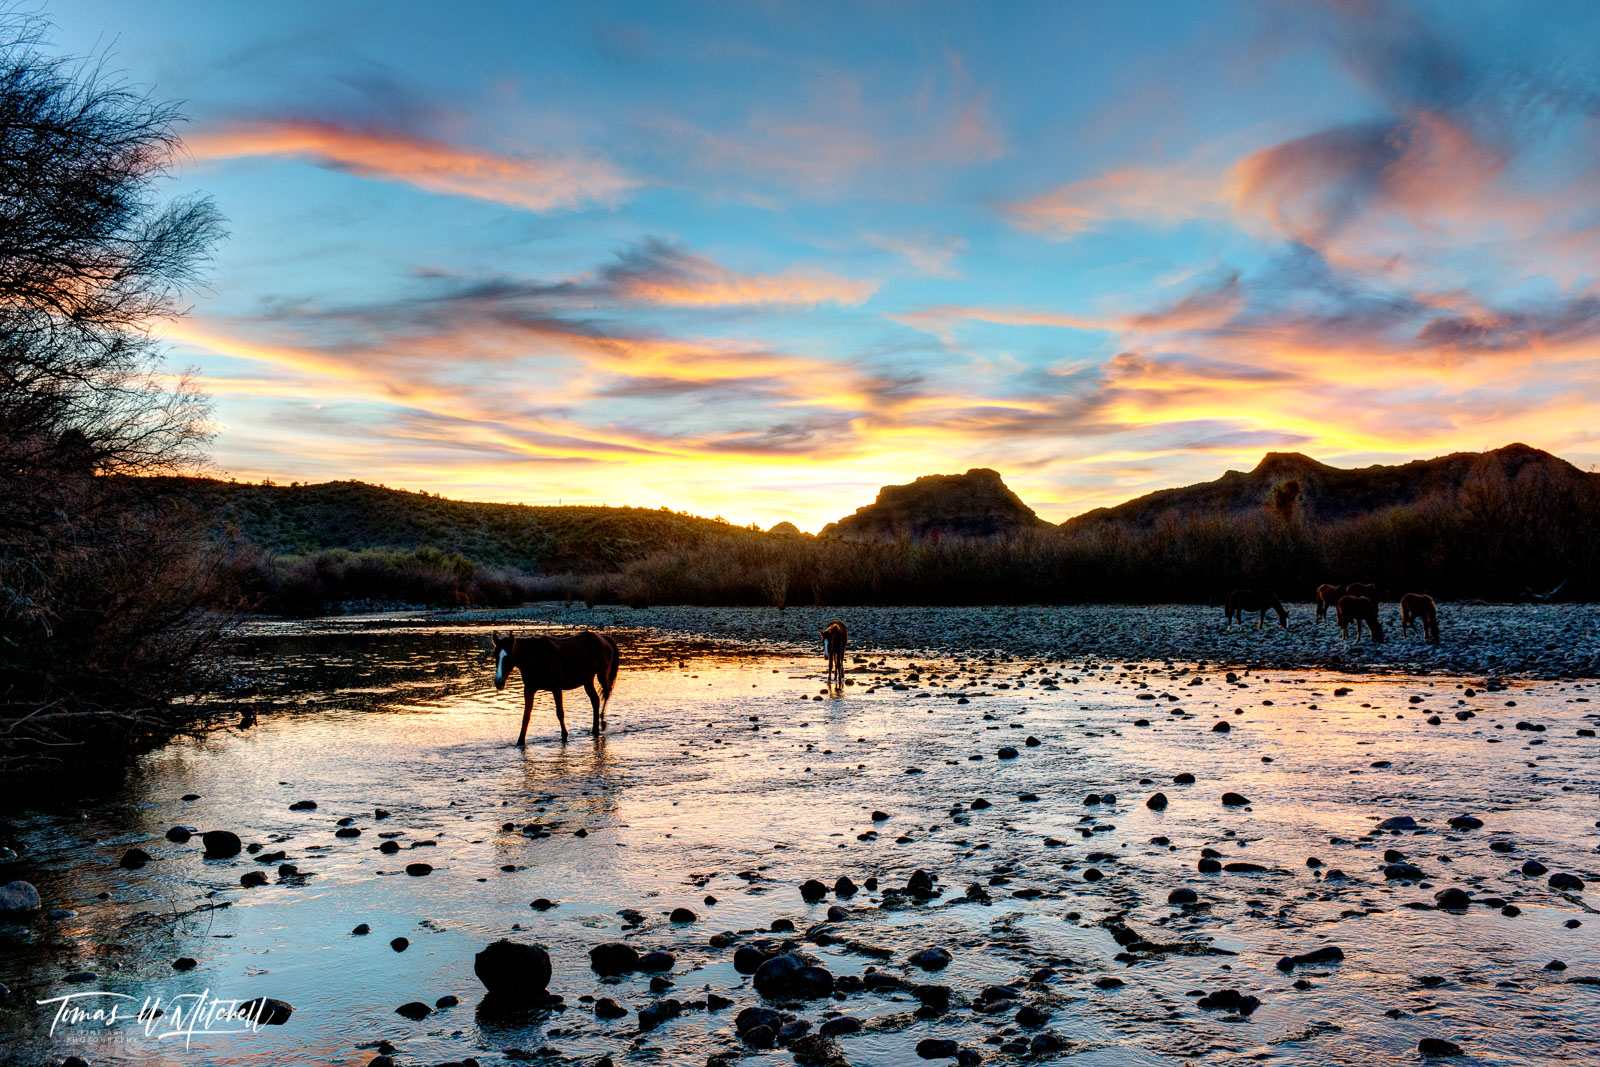 limited edition, fine art, prints, salt river, arizona, sunset, horses, photograph, , photo